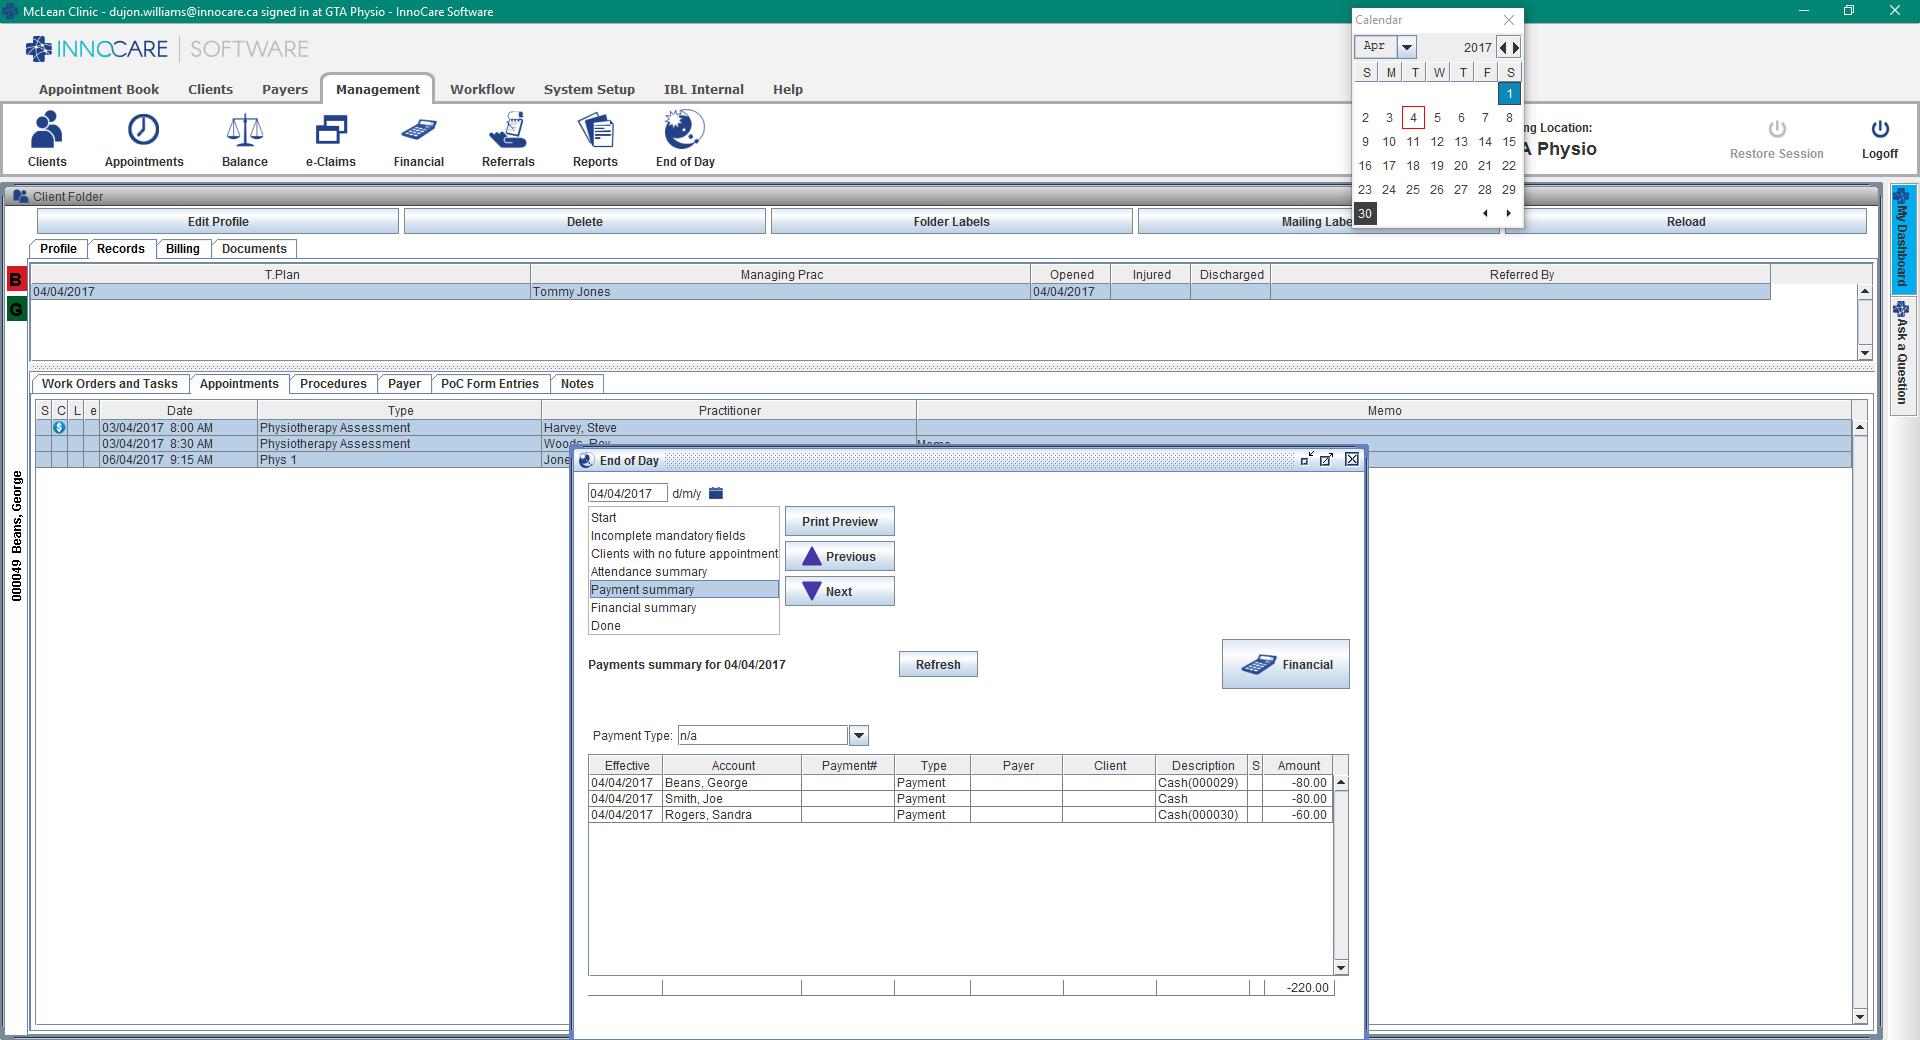 InnoCare Software Demo - InnoCare Software Reporting